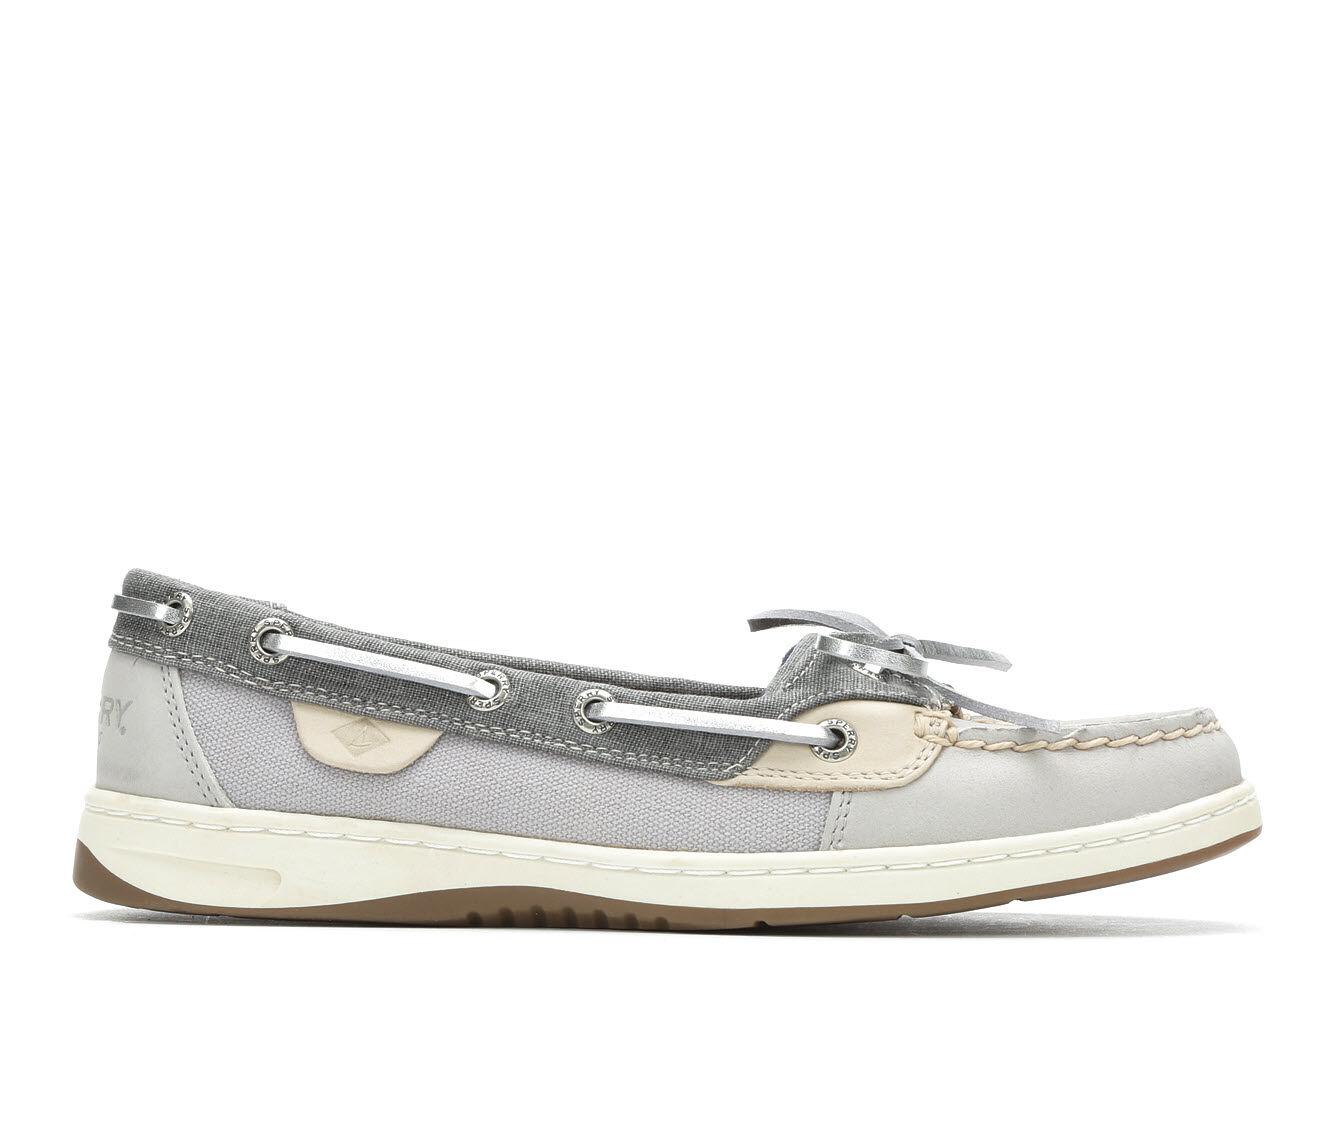 uk shoes_kd3027